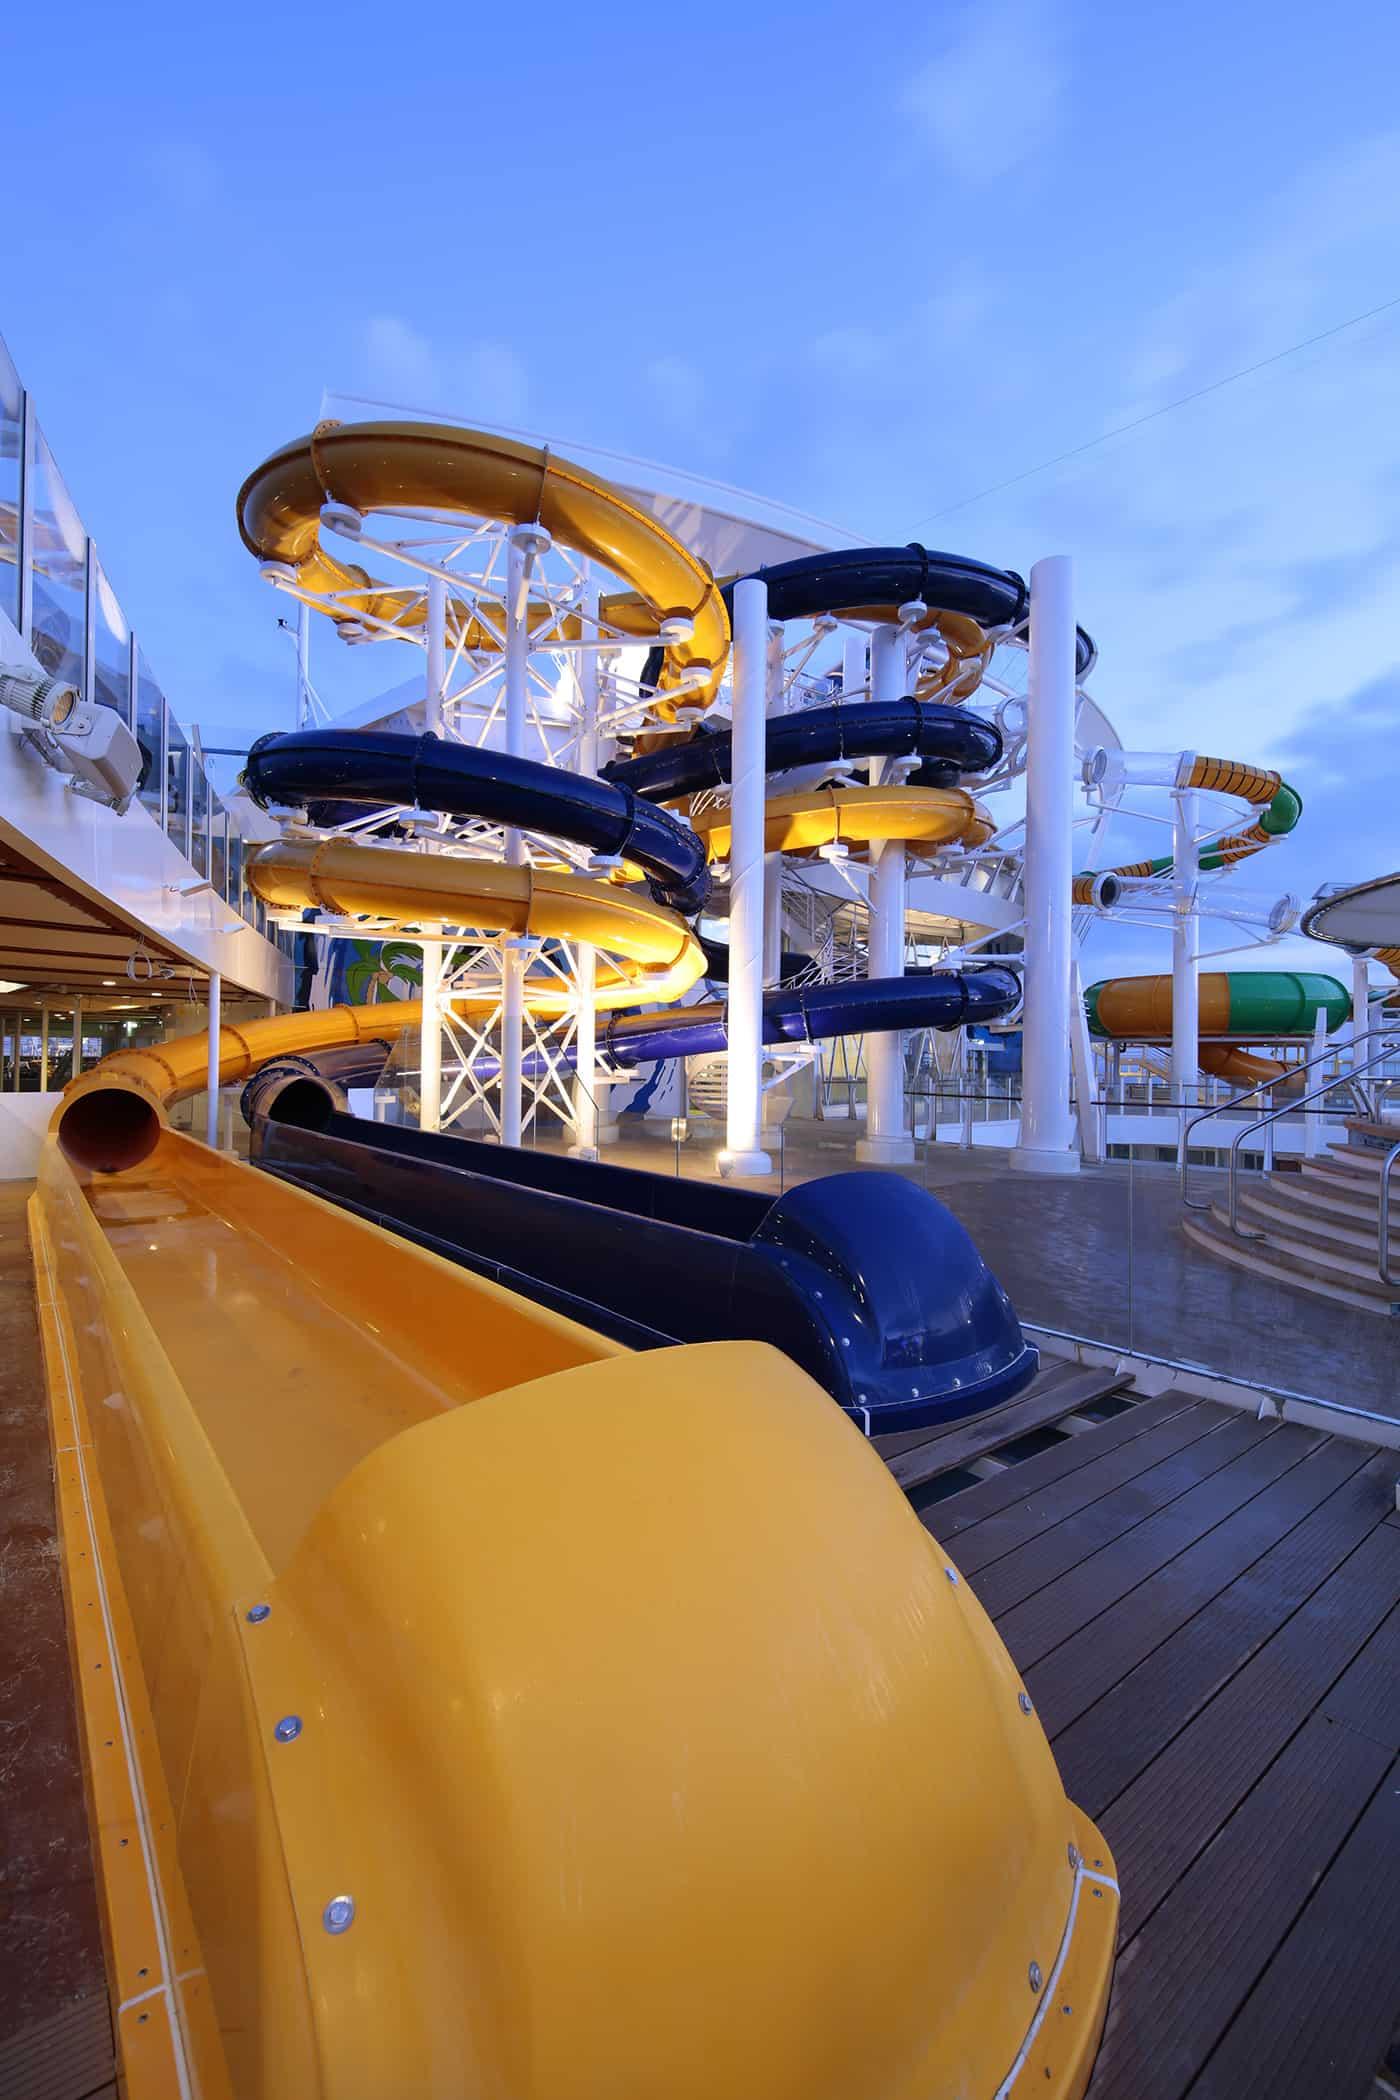 The Perfect Storm - Deck 15/16 Midship Harmony of the Seas - Royal Caribbean International